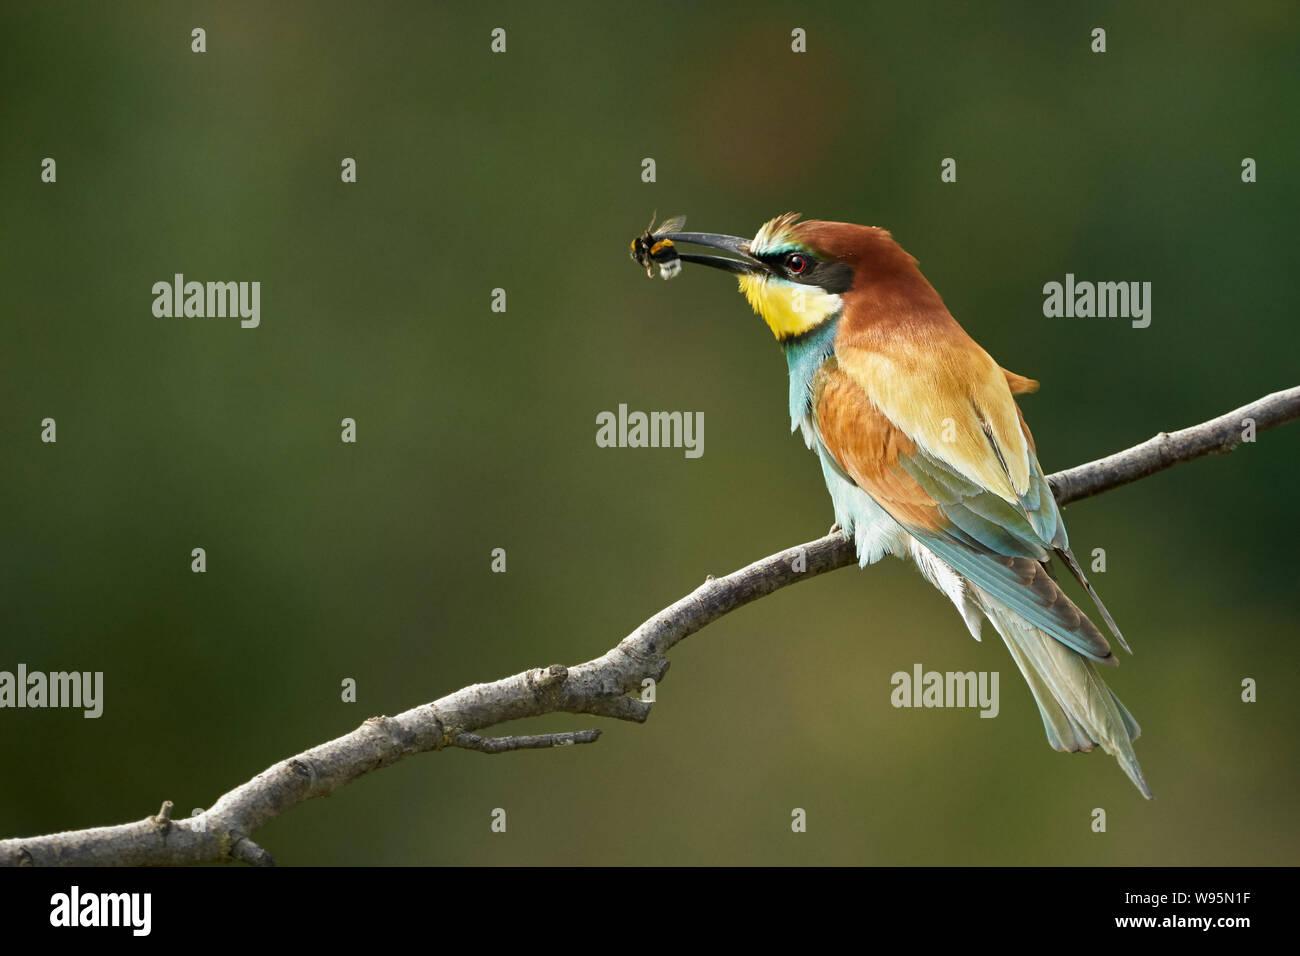 El abejorro europeo (Merops apiaster) capturó un abejorro Foto de stock